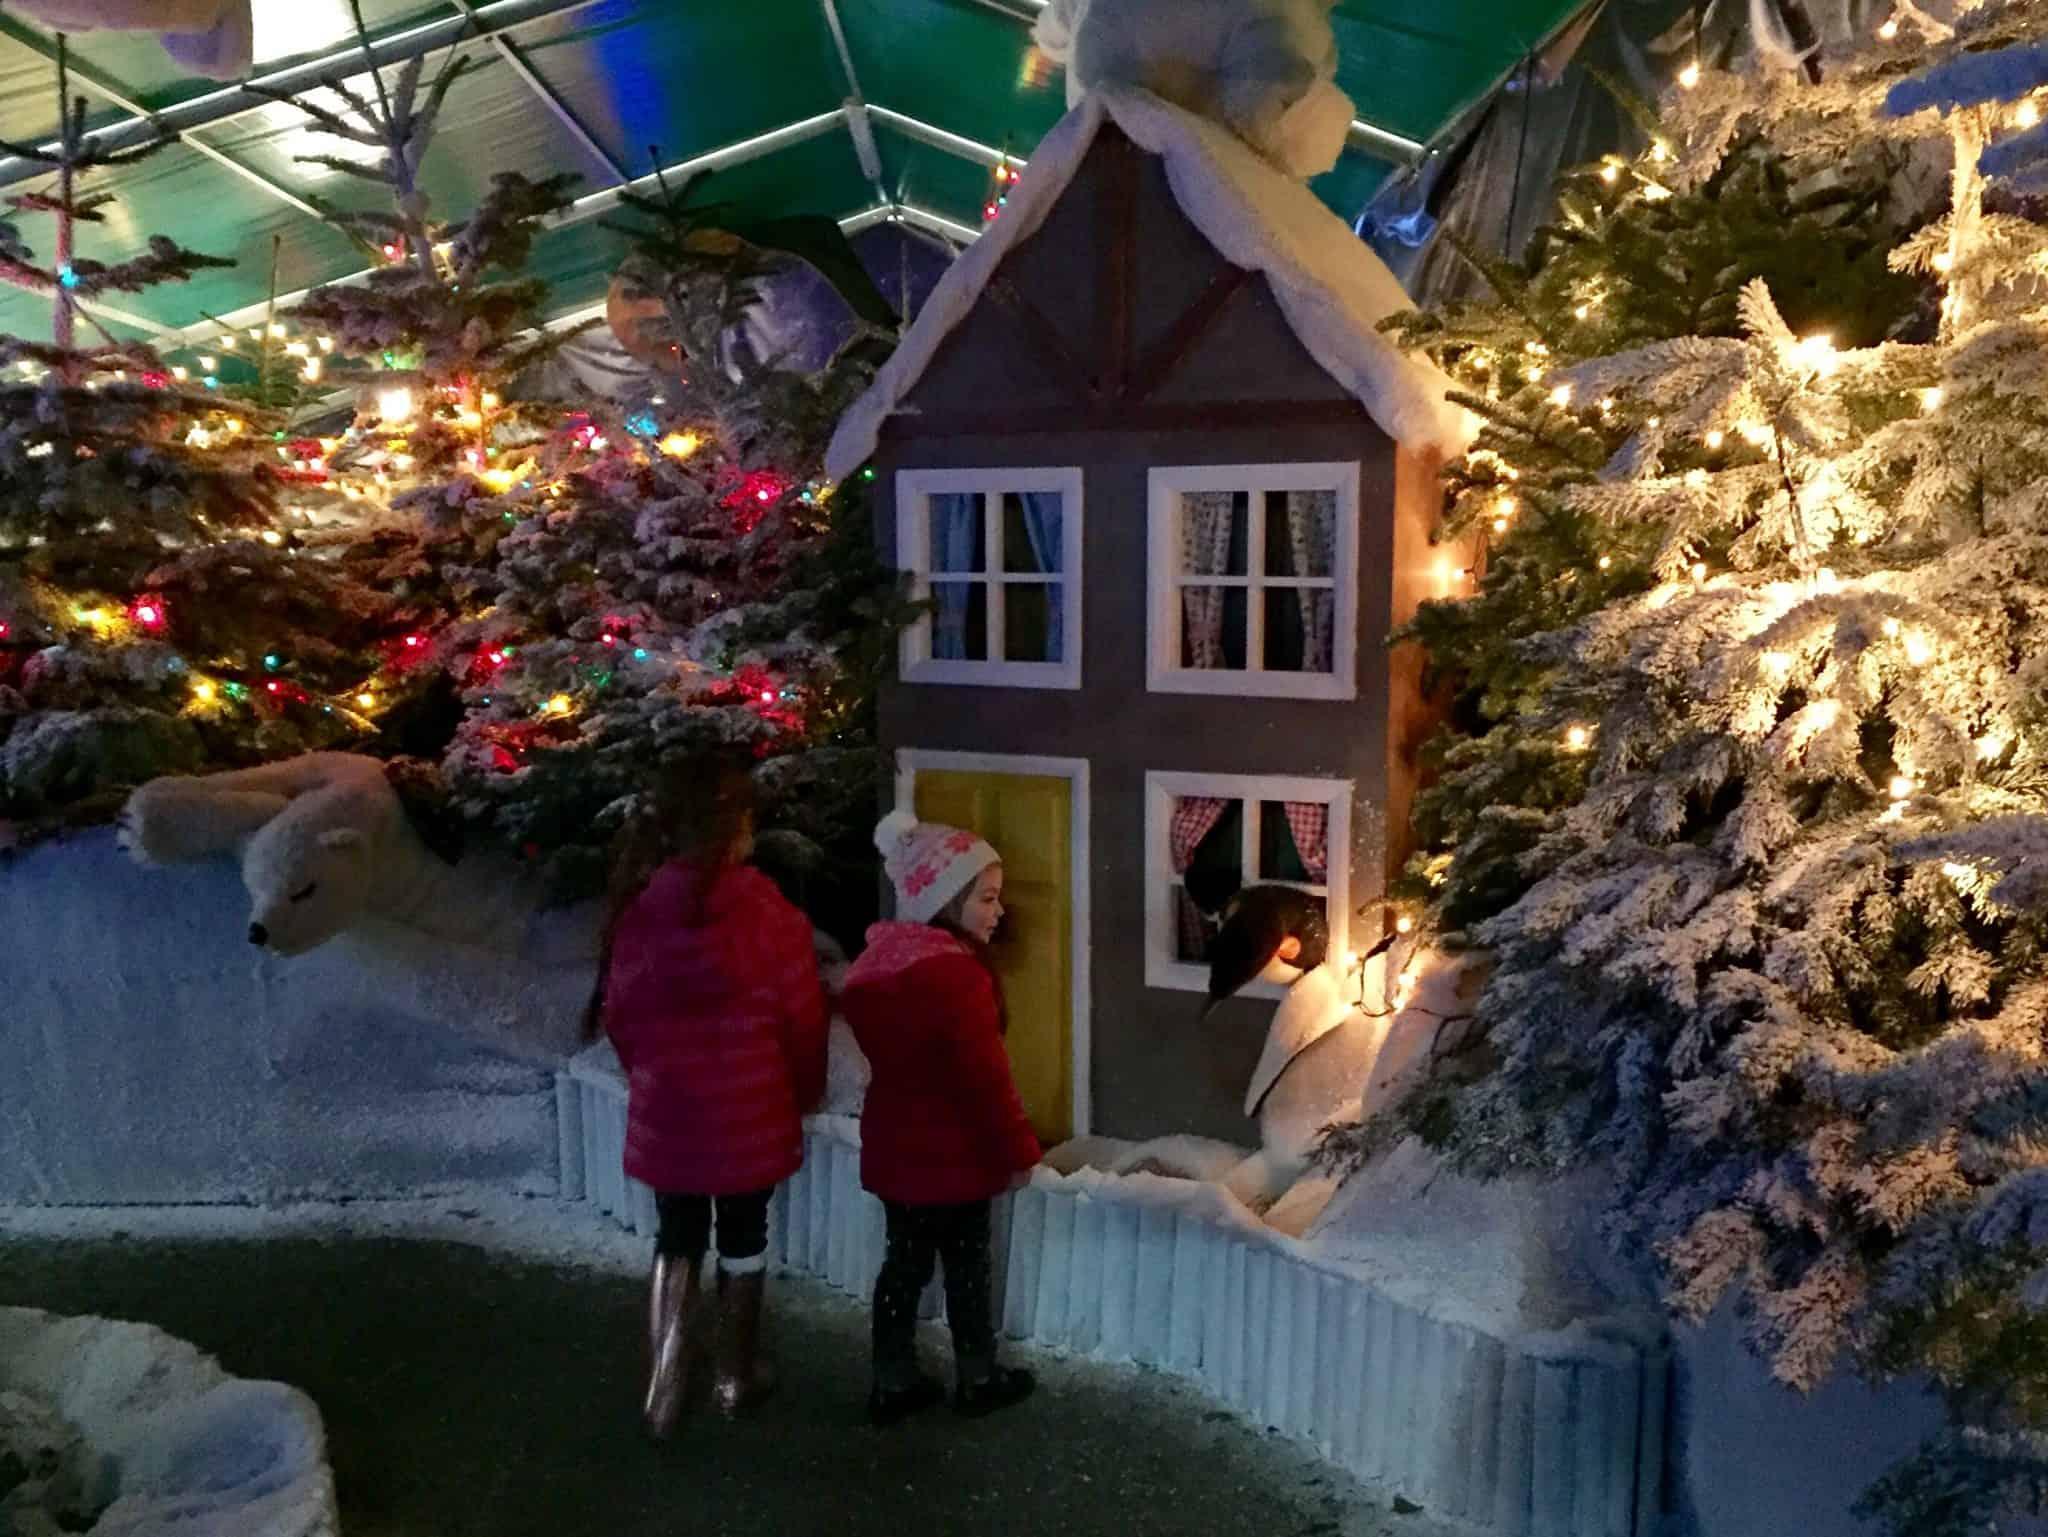 Peeping through a window at Winter Wonderland at World's End